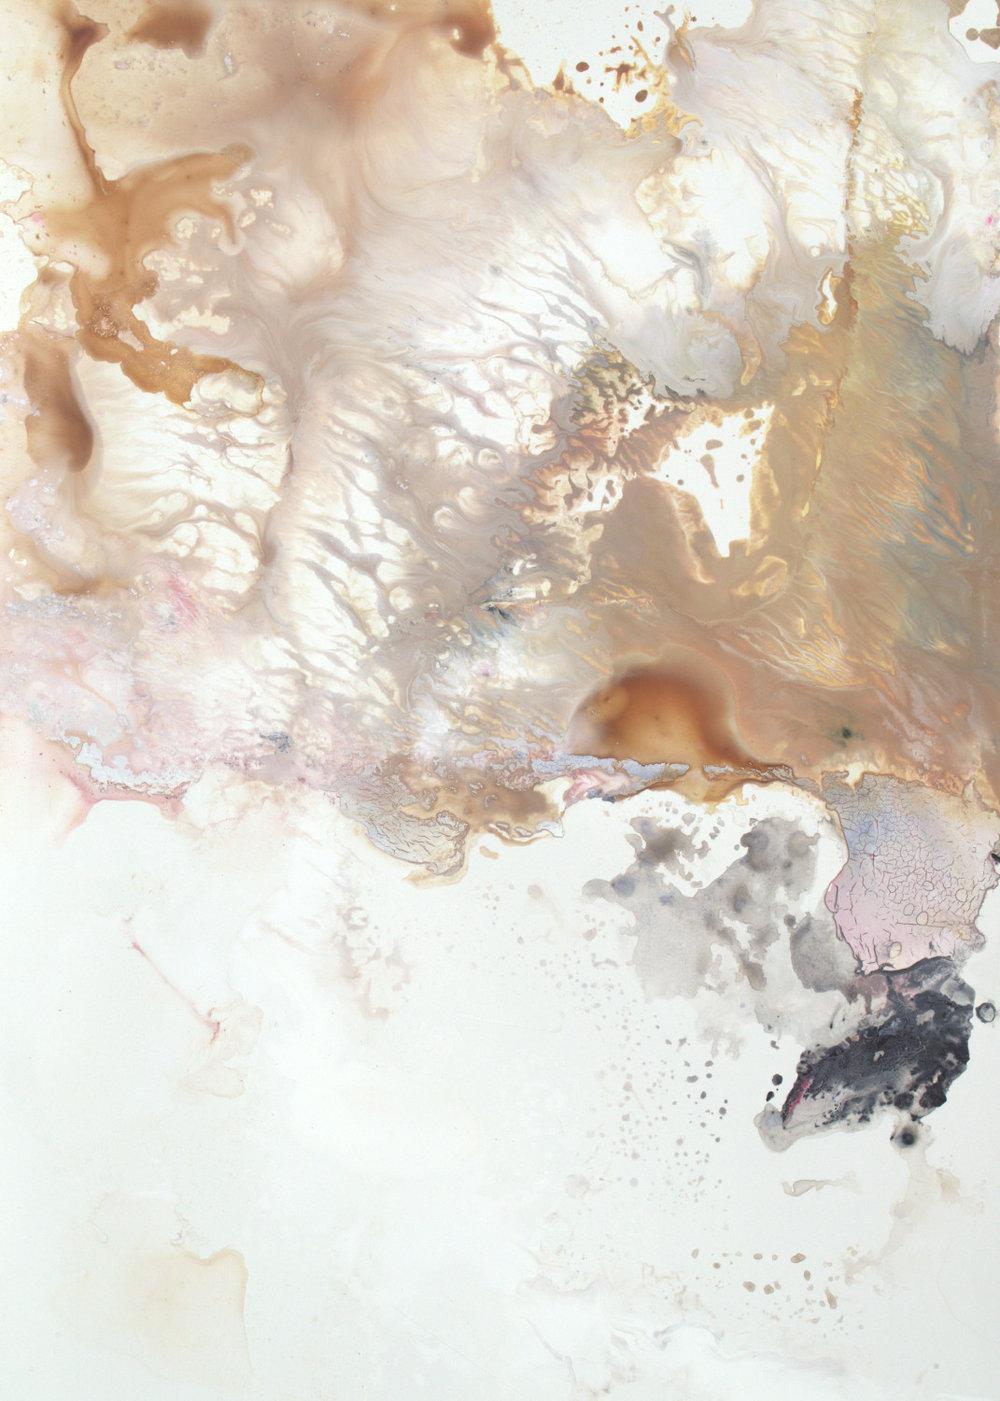 Abstract Organic Contrmporary III - 12x9